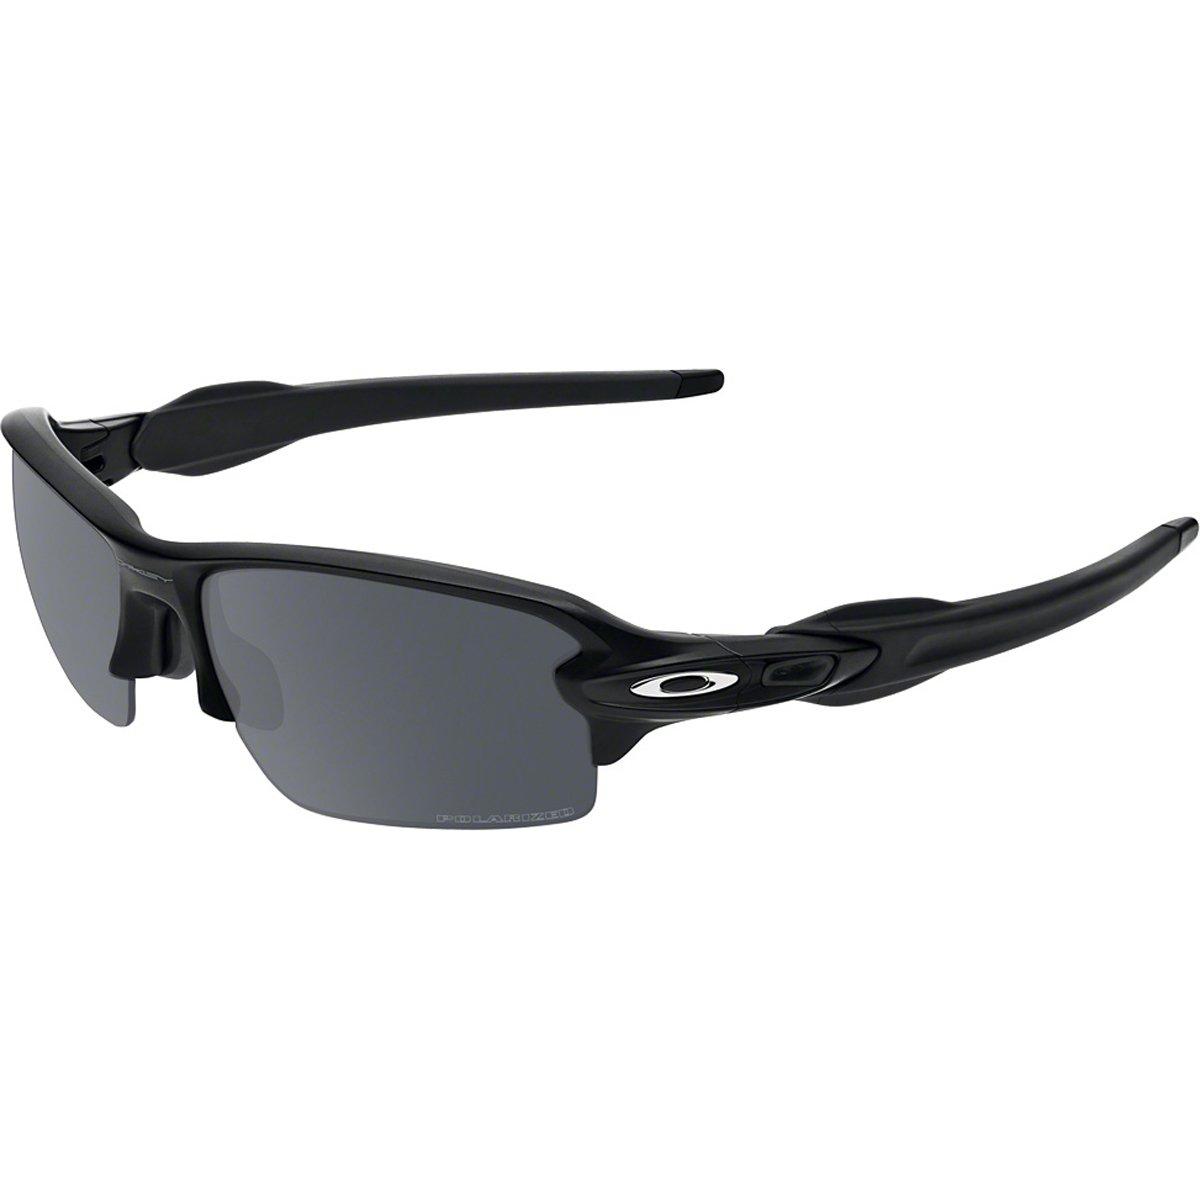 e7d759e255e2 Amazon.com: Oakley Men's MPH Flak 2.0 Polarized Matte Heather Grey/Black  One Size: Sports & Outdoors